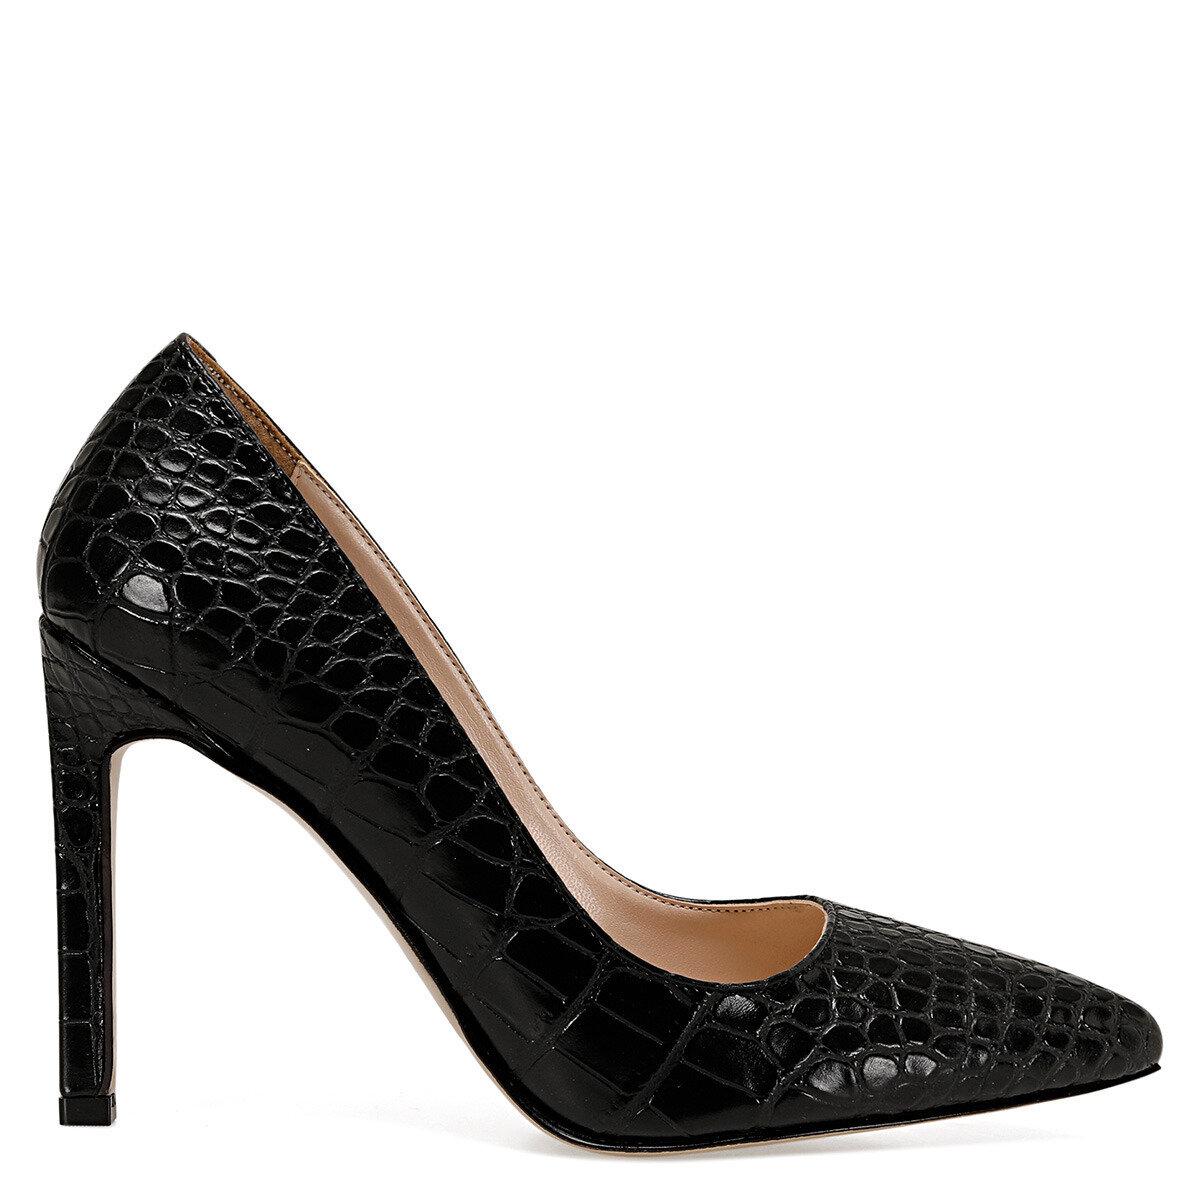 TANITA2 Siyah Kadın Stiletto